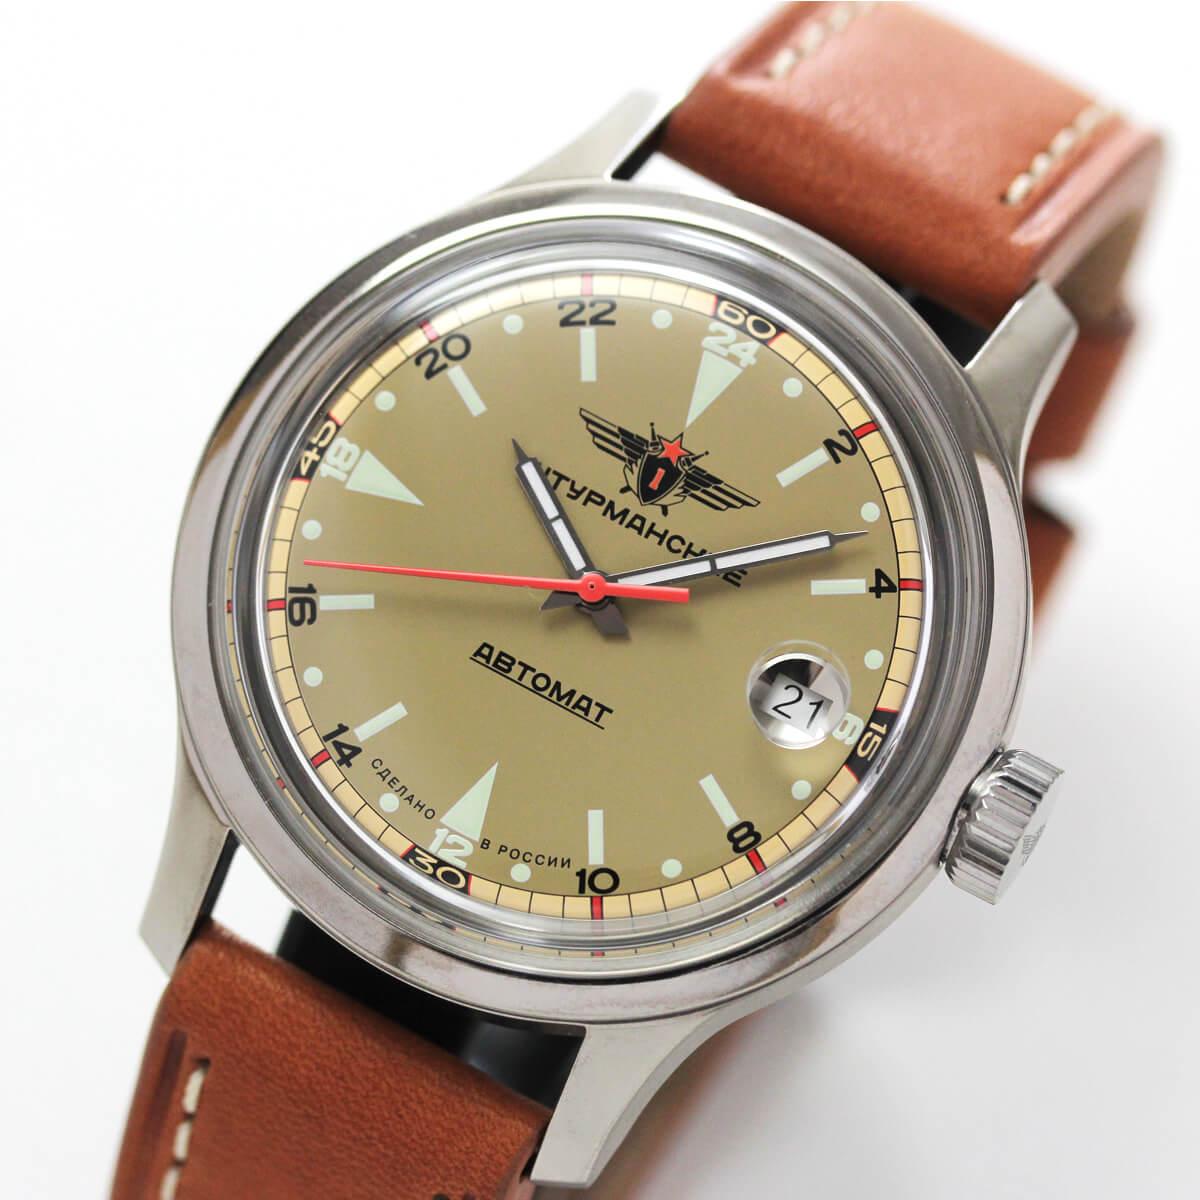 SPACE PIONEERS 2431-1767936 ロシアブランド シュトルマンスキー腕時計